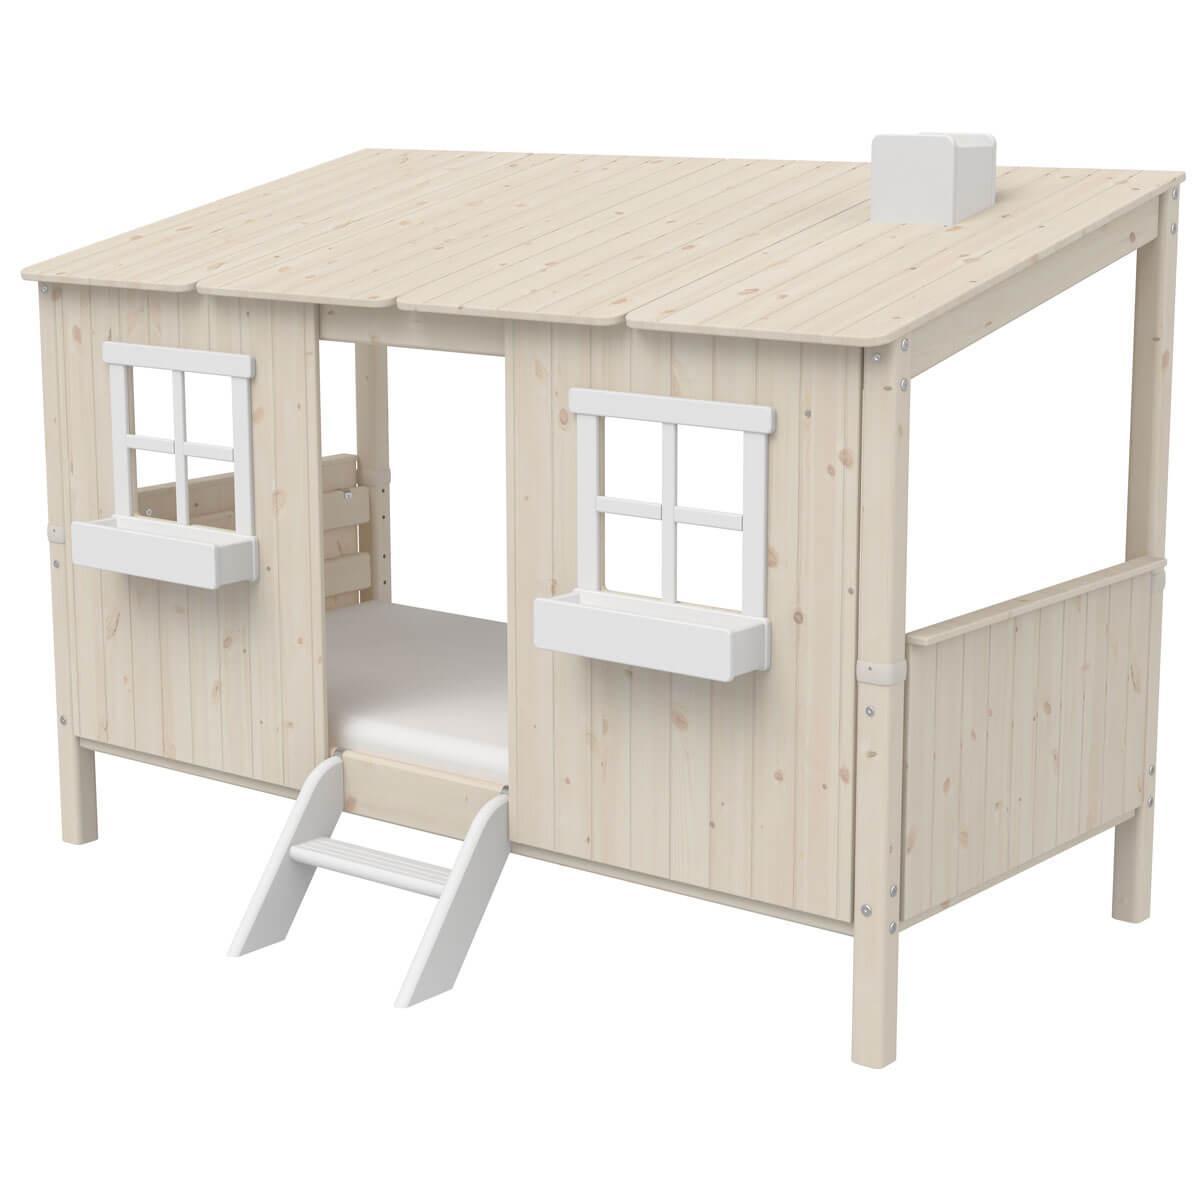 Spielbett Baumhaus 90x200cm 1/1 PLAY HOUSE CLASSIC Flexa whitewash-weiß